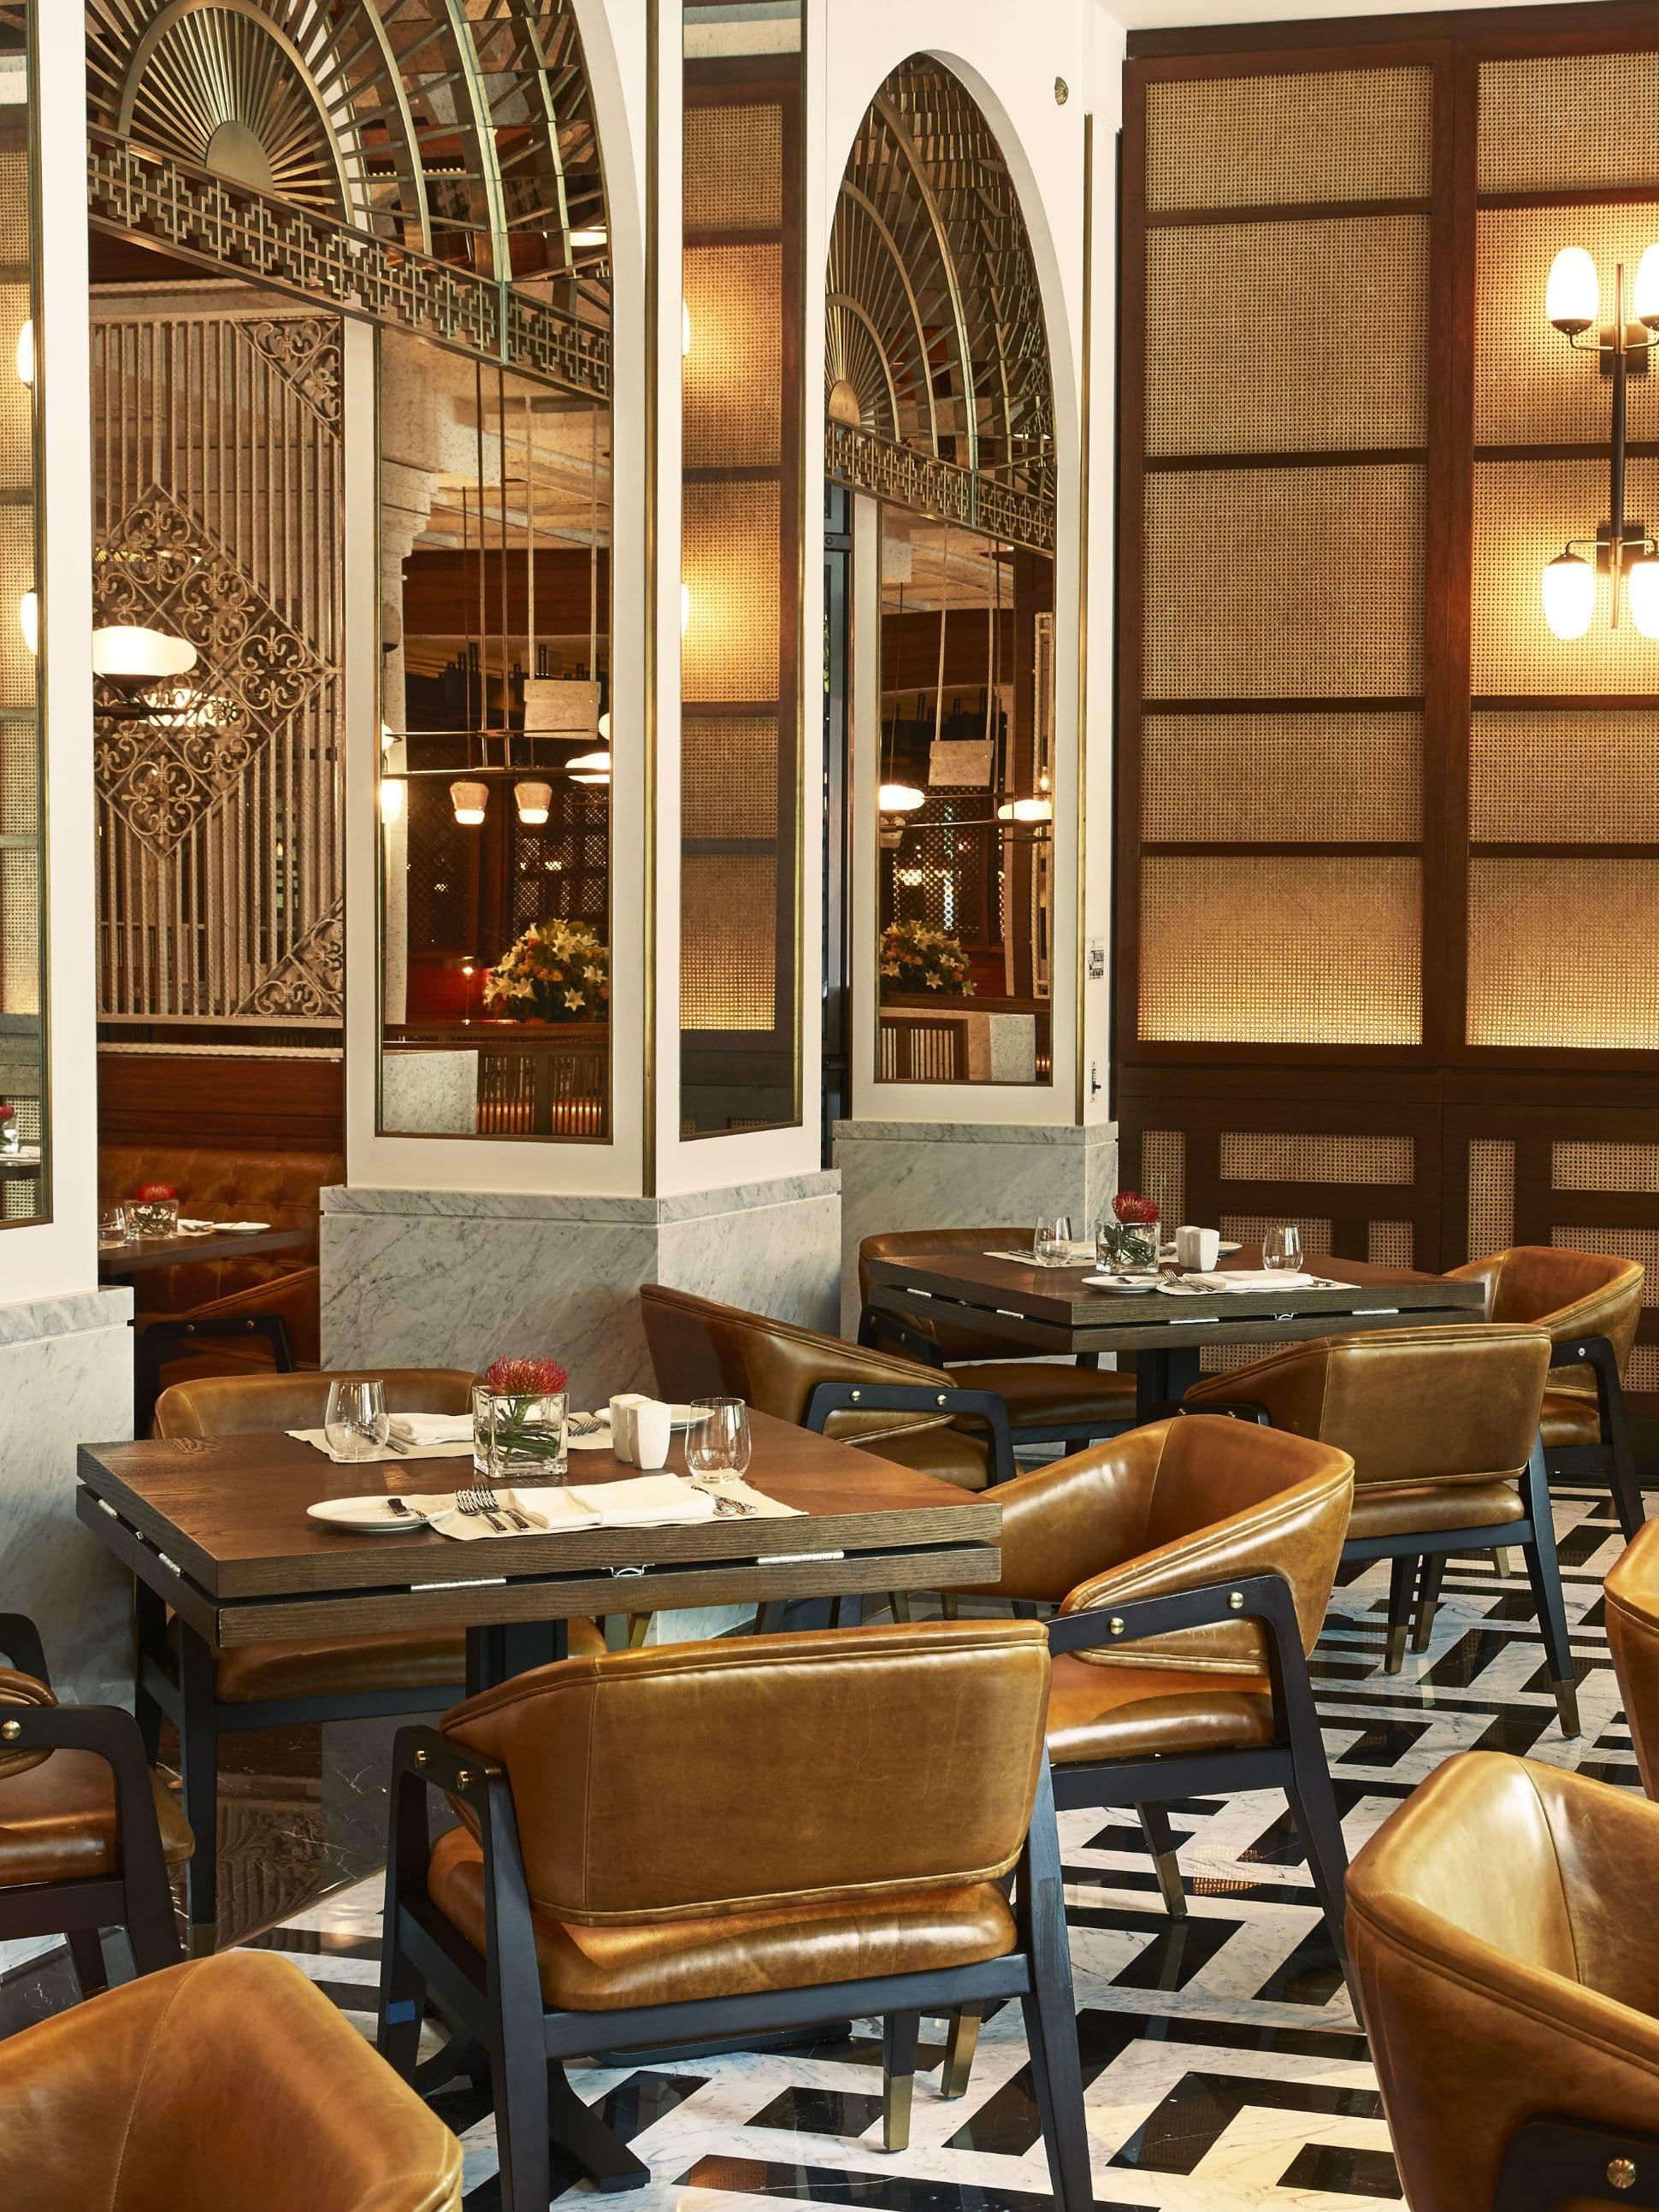 Restaurant interiors by the late designer Jaya Ibrahim.